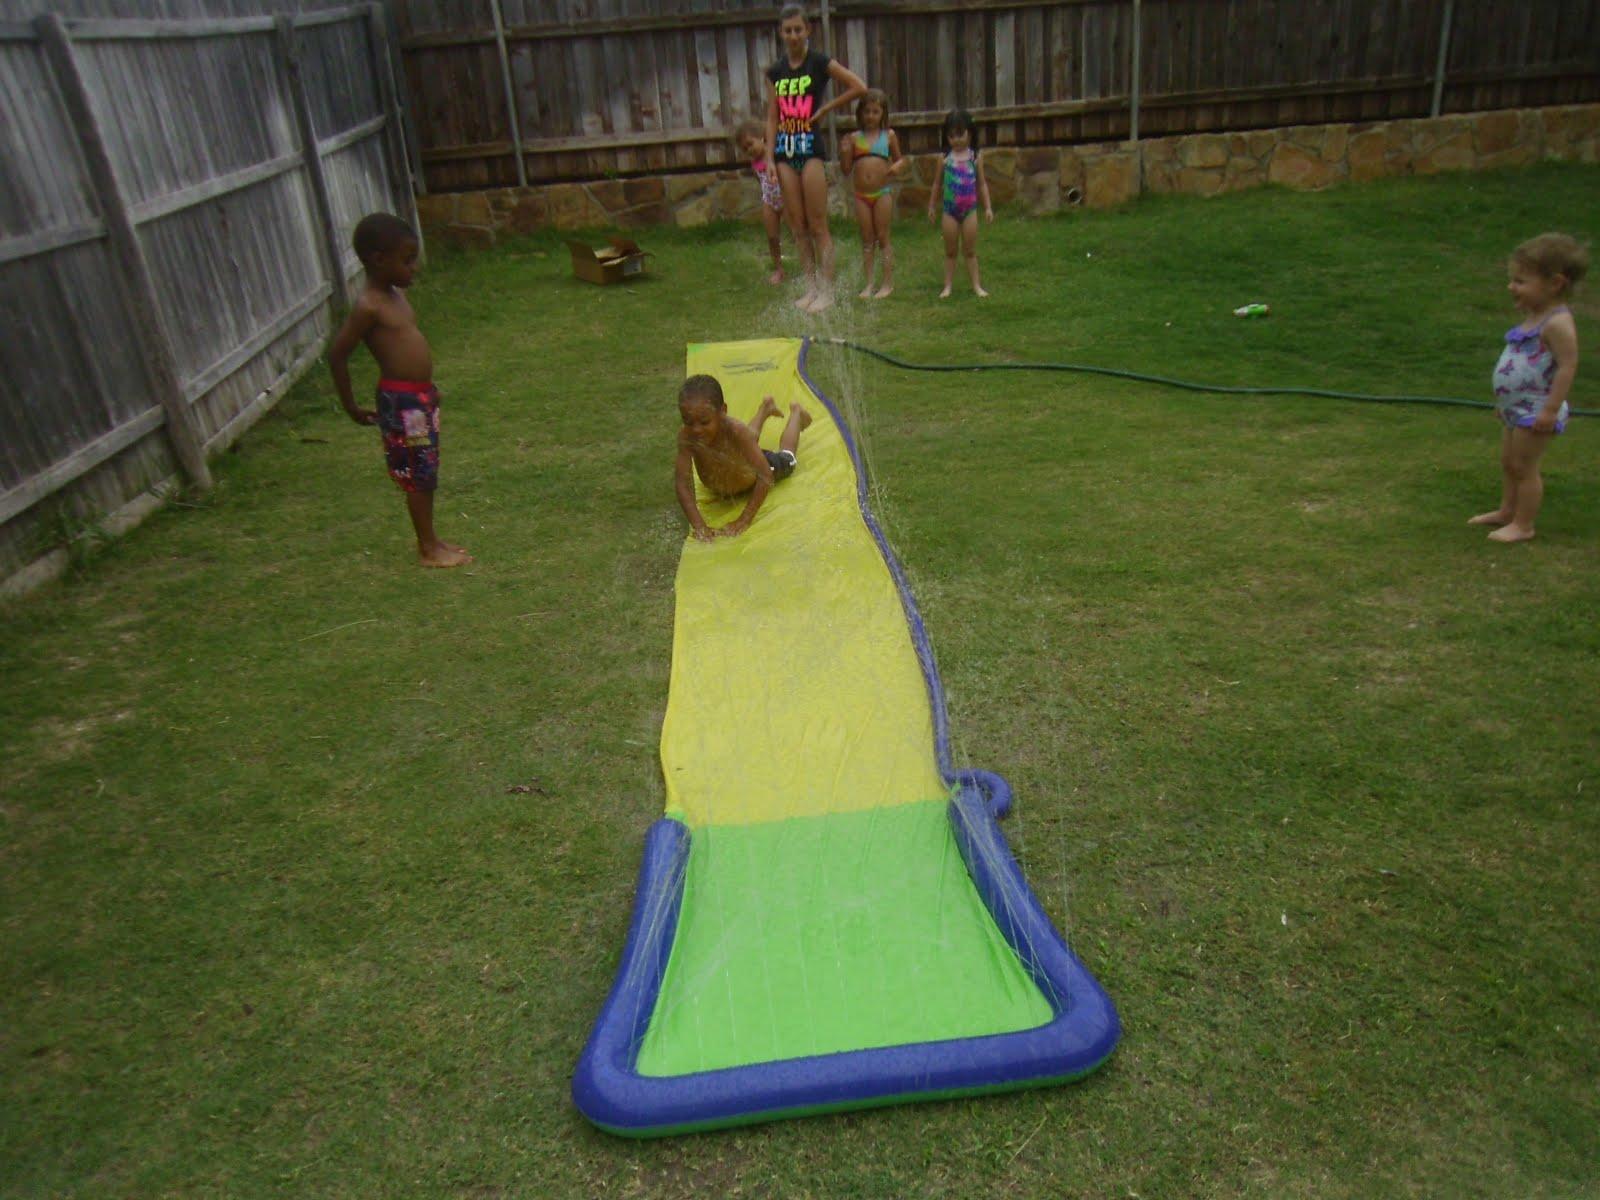 Big Backyard Daycare : The Big Texas Hill Family Daycare kids backyard slip n slide )